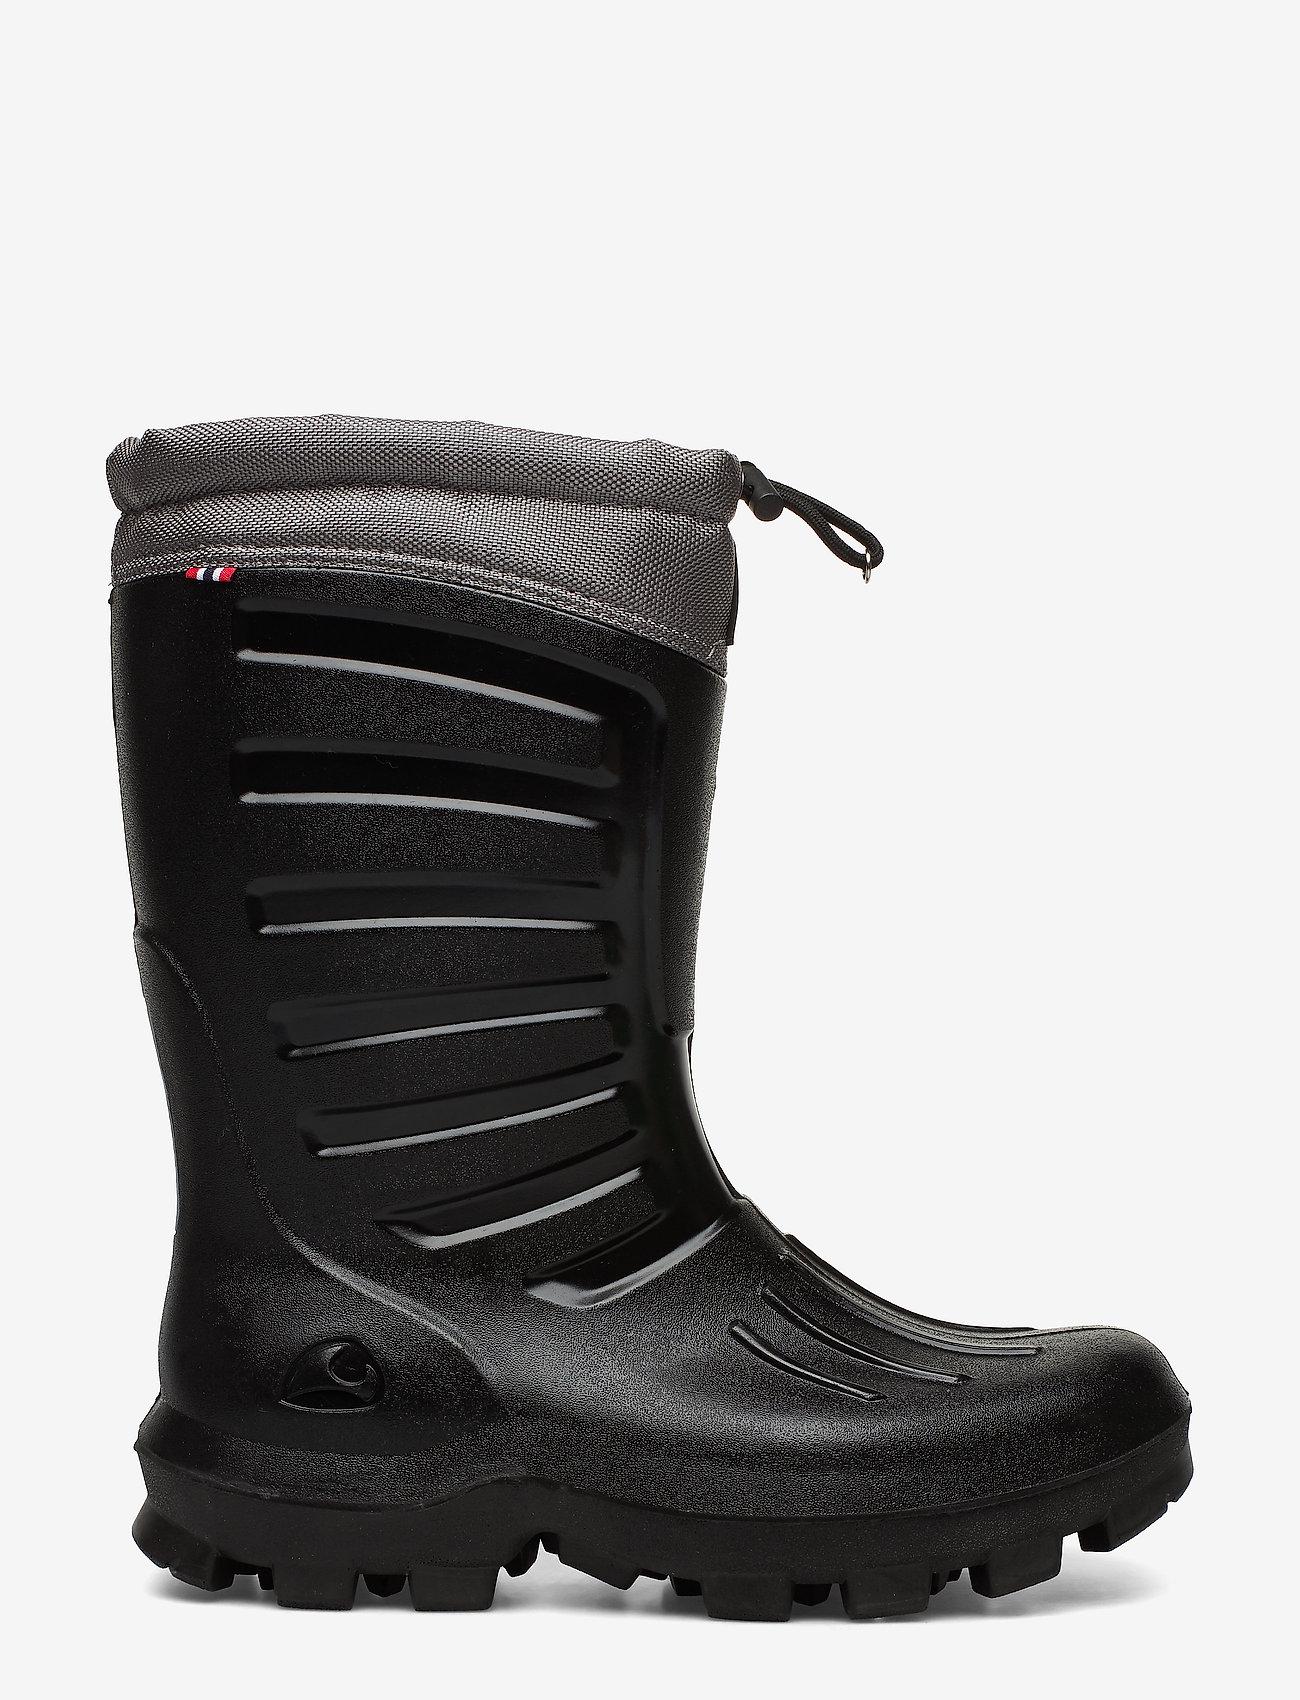 Arctic 20 (Black/dark Grey) (71.96 €) - Viking og7Br